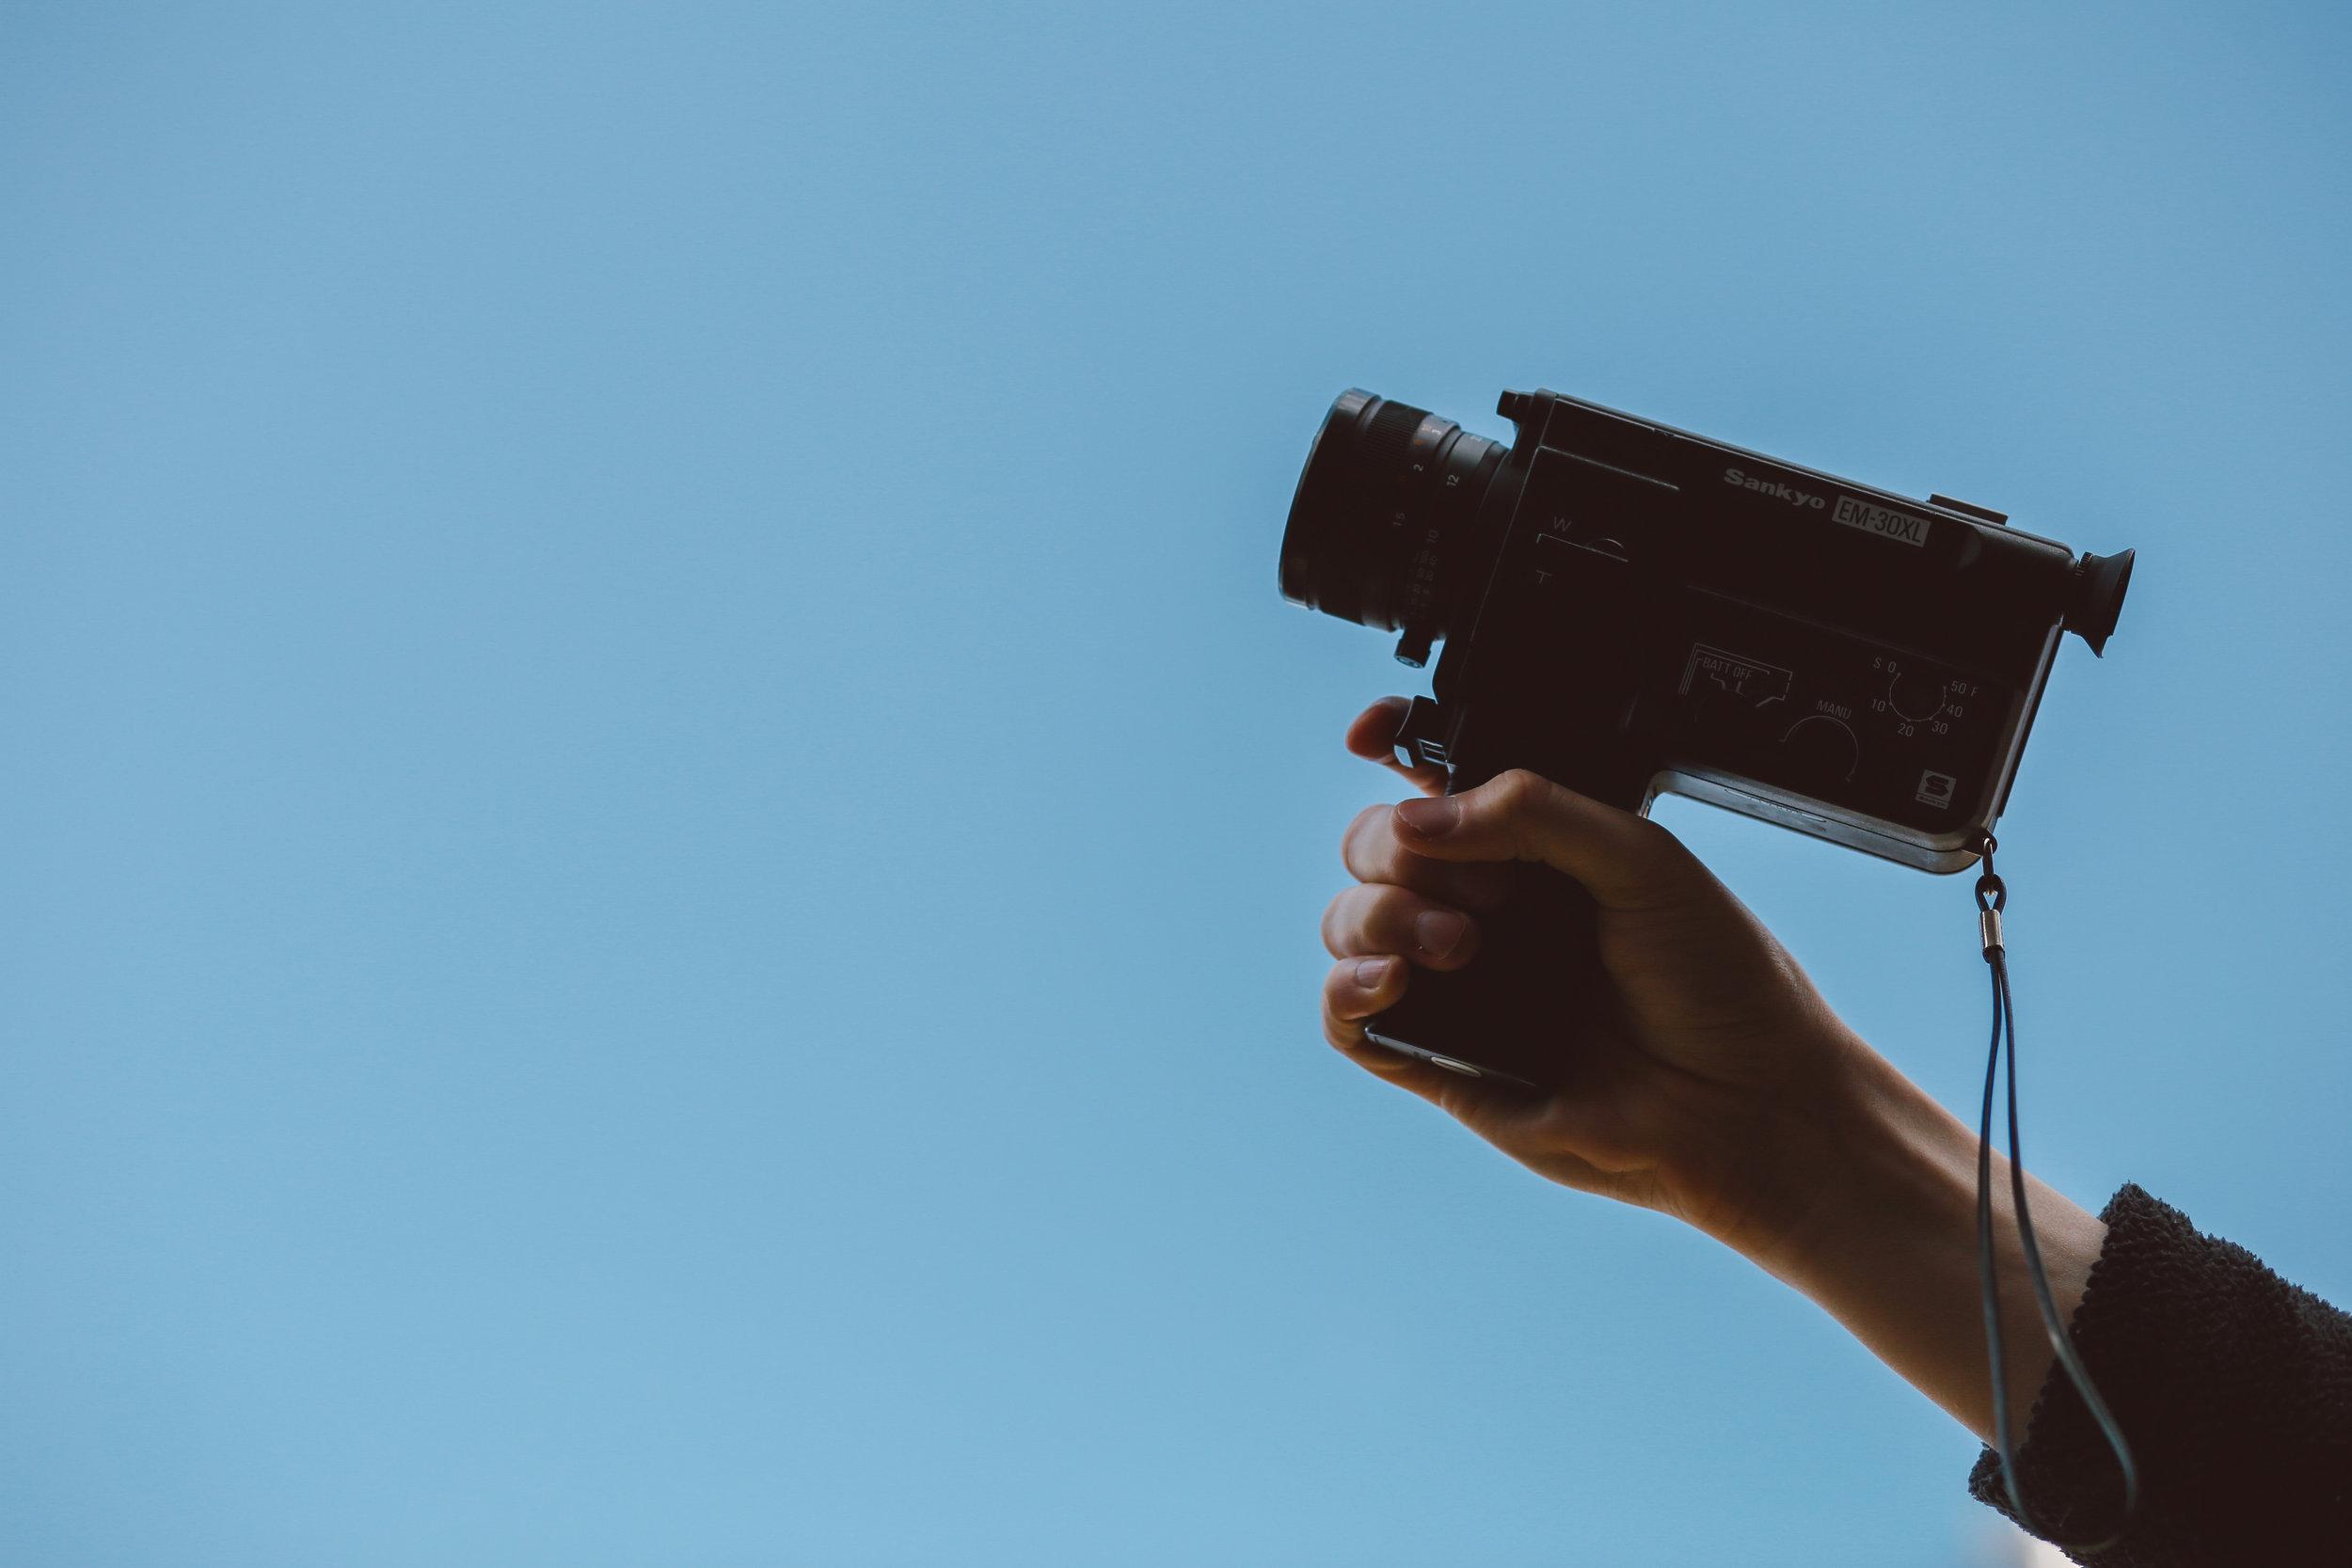 VIDEO RESOURCE - Wills + Powers of Attorney